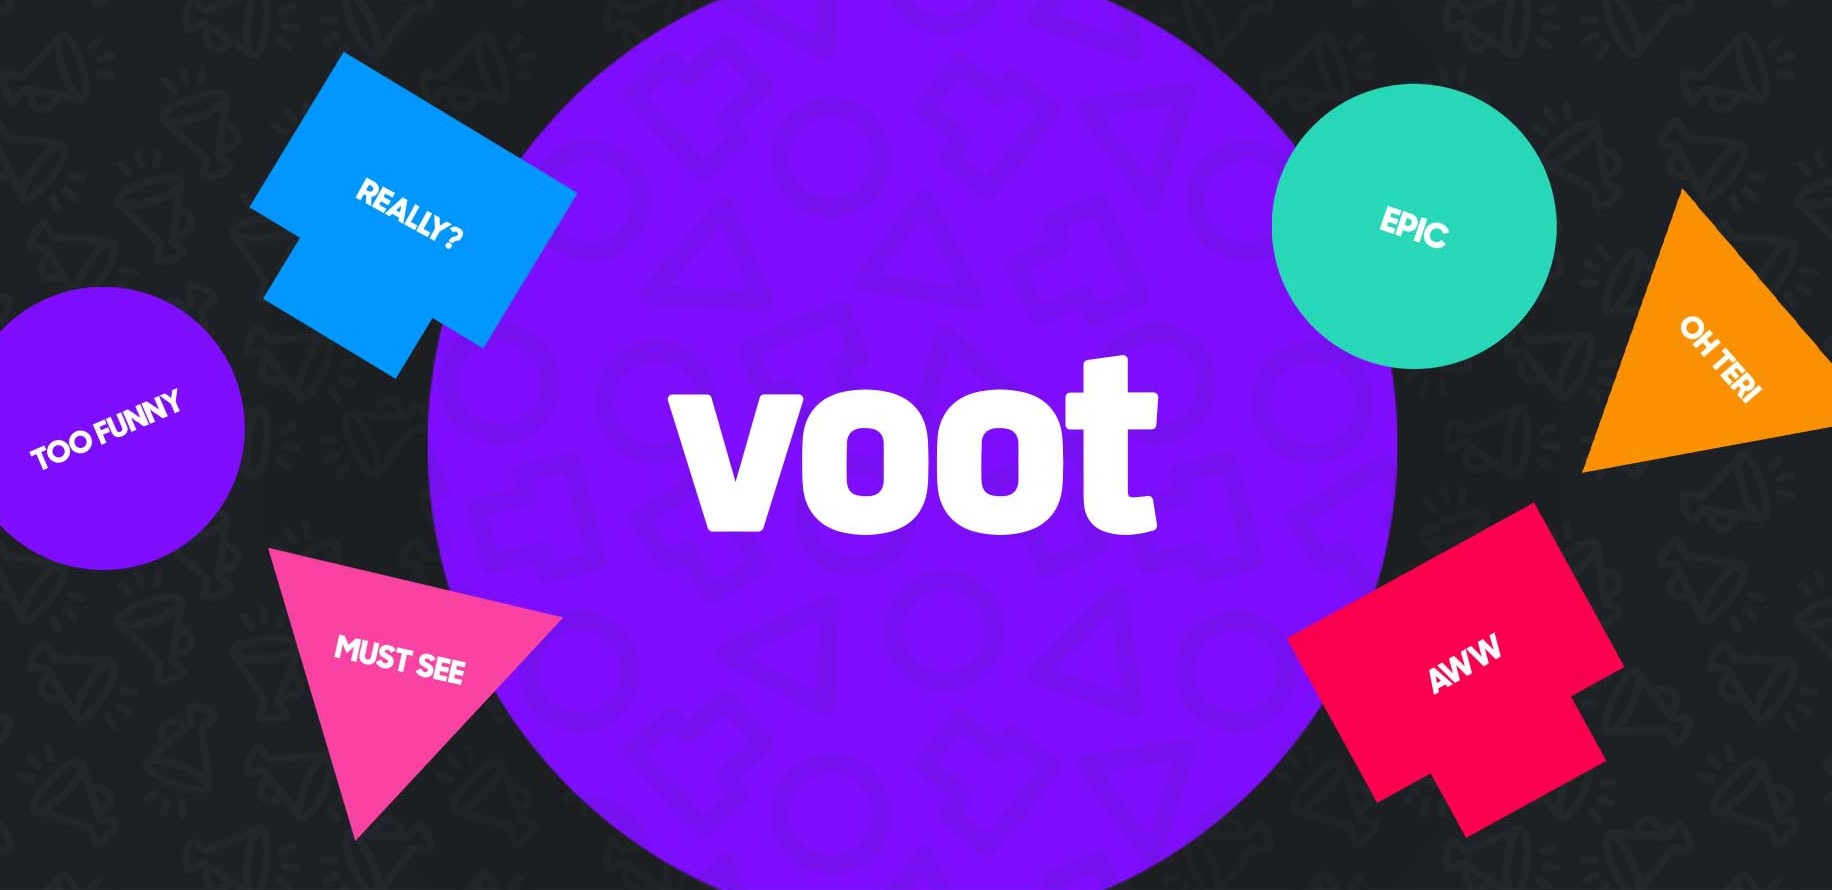 Voot - Native App — jessiewlee